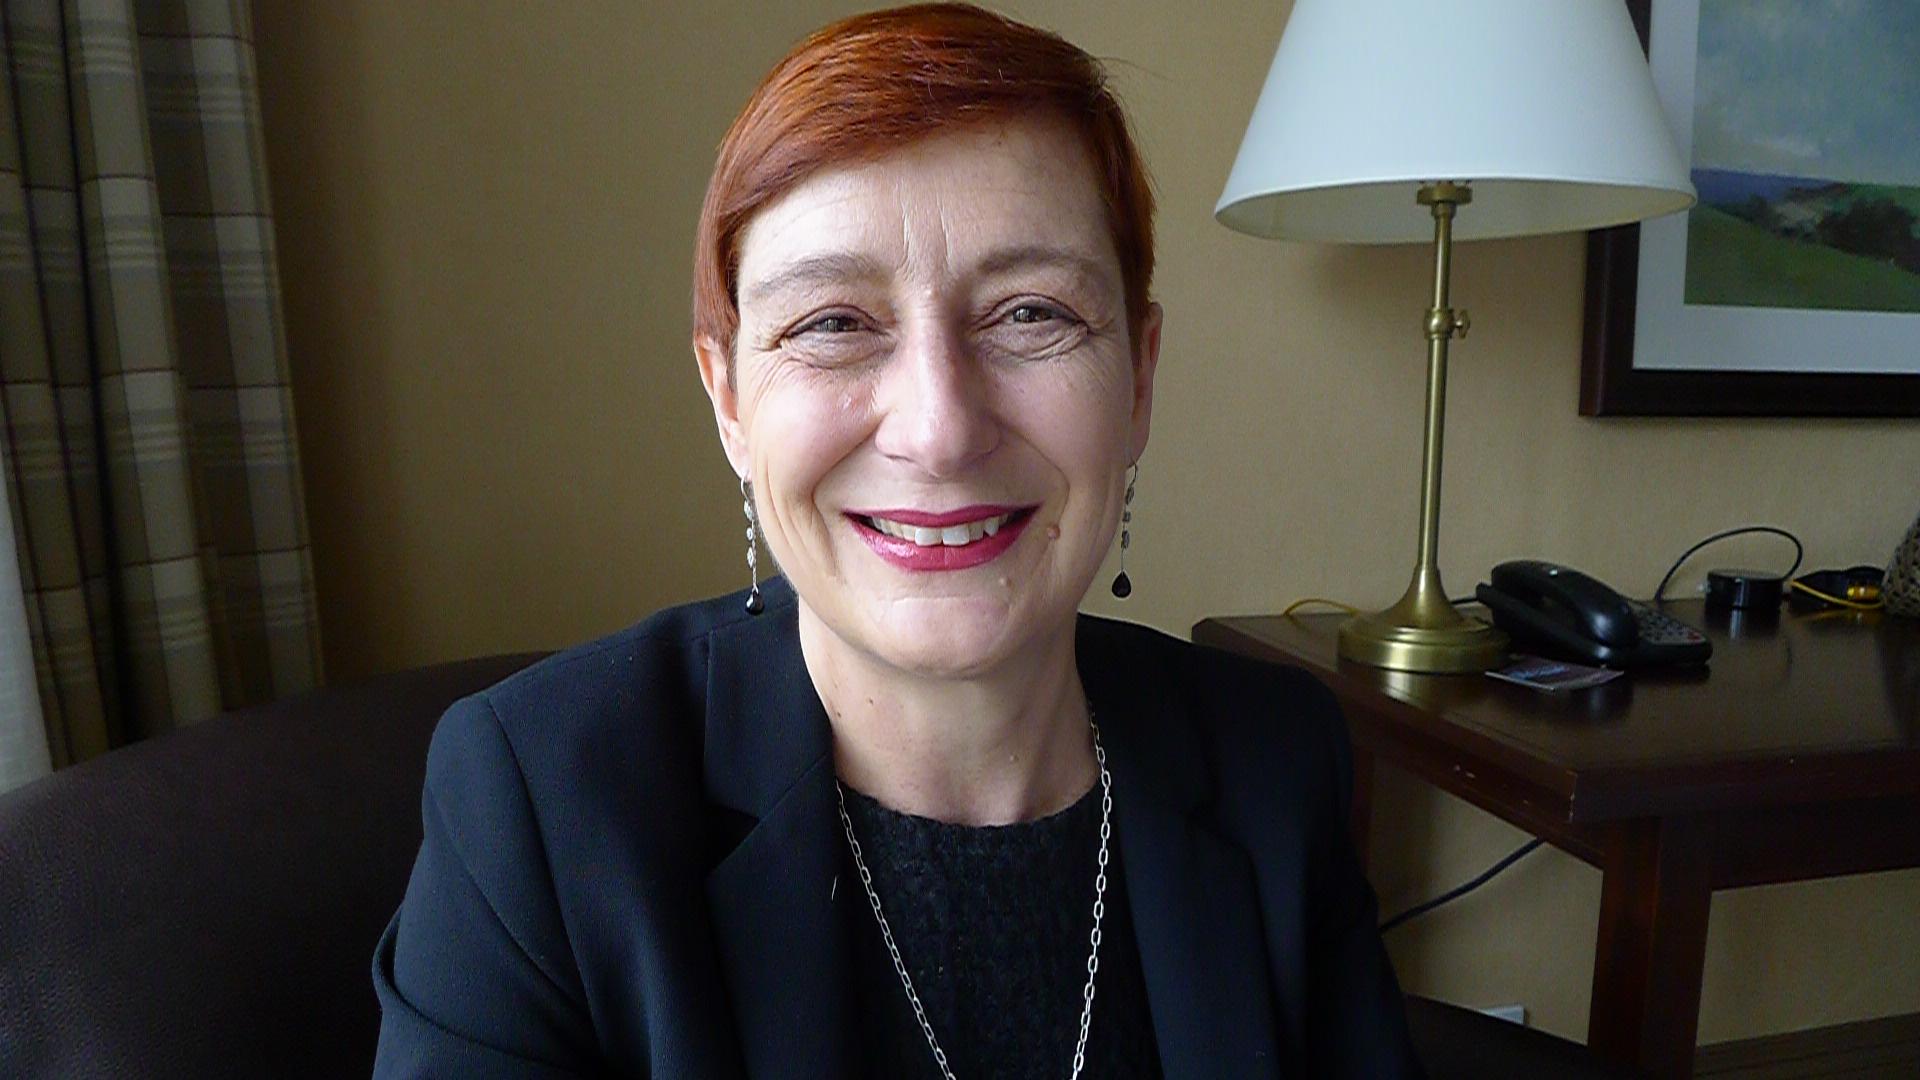 Marilena Cocci Grifoni visited us in Toronto for The Vine's portfolio tasting in 2015.